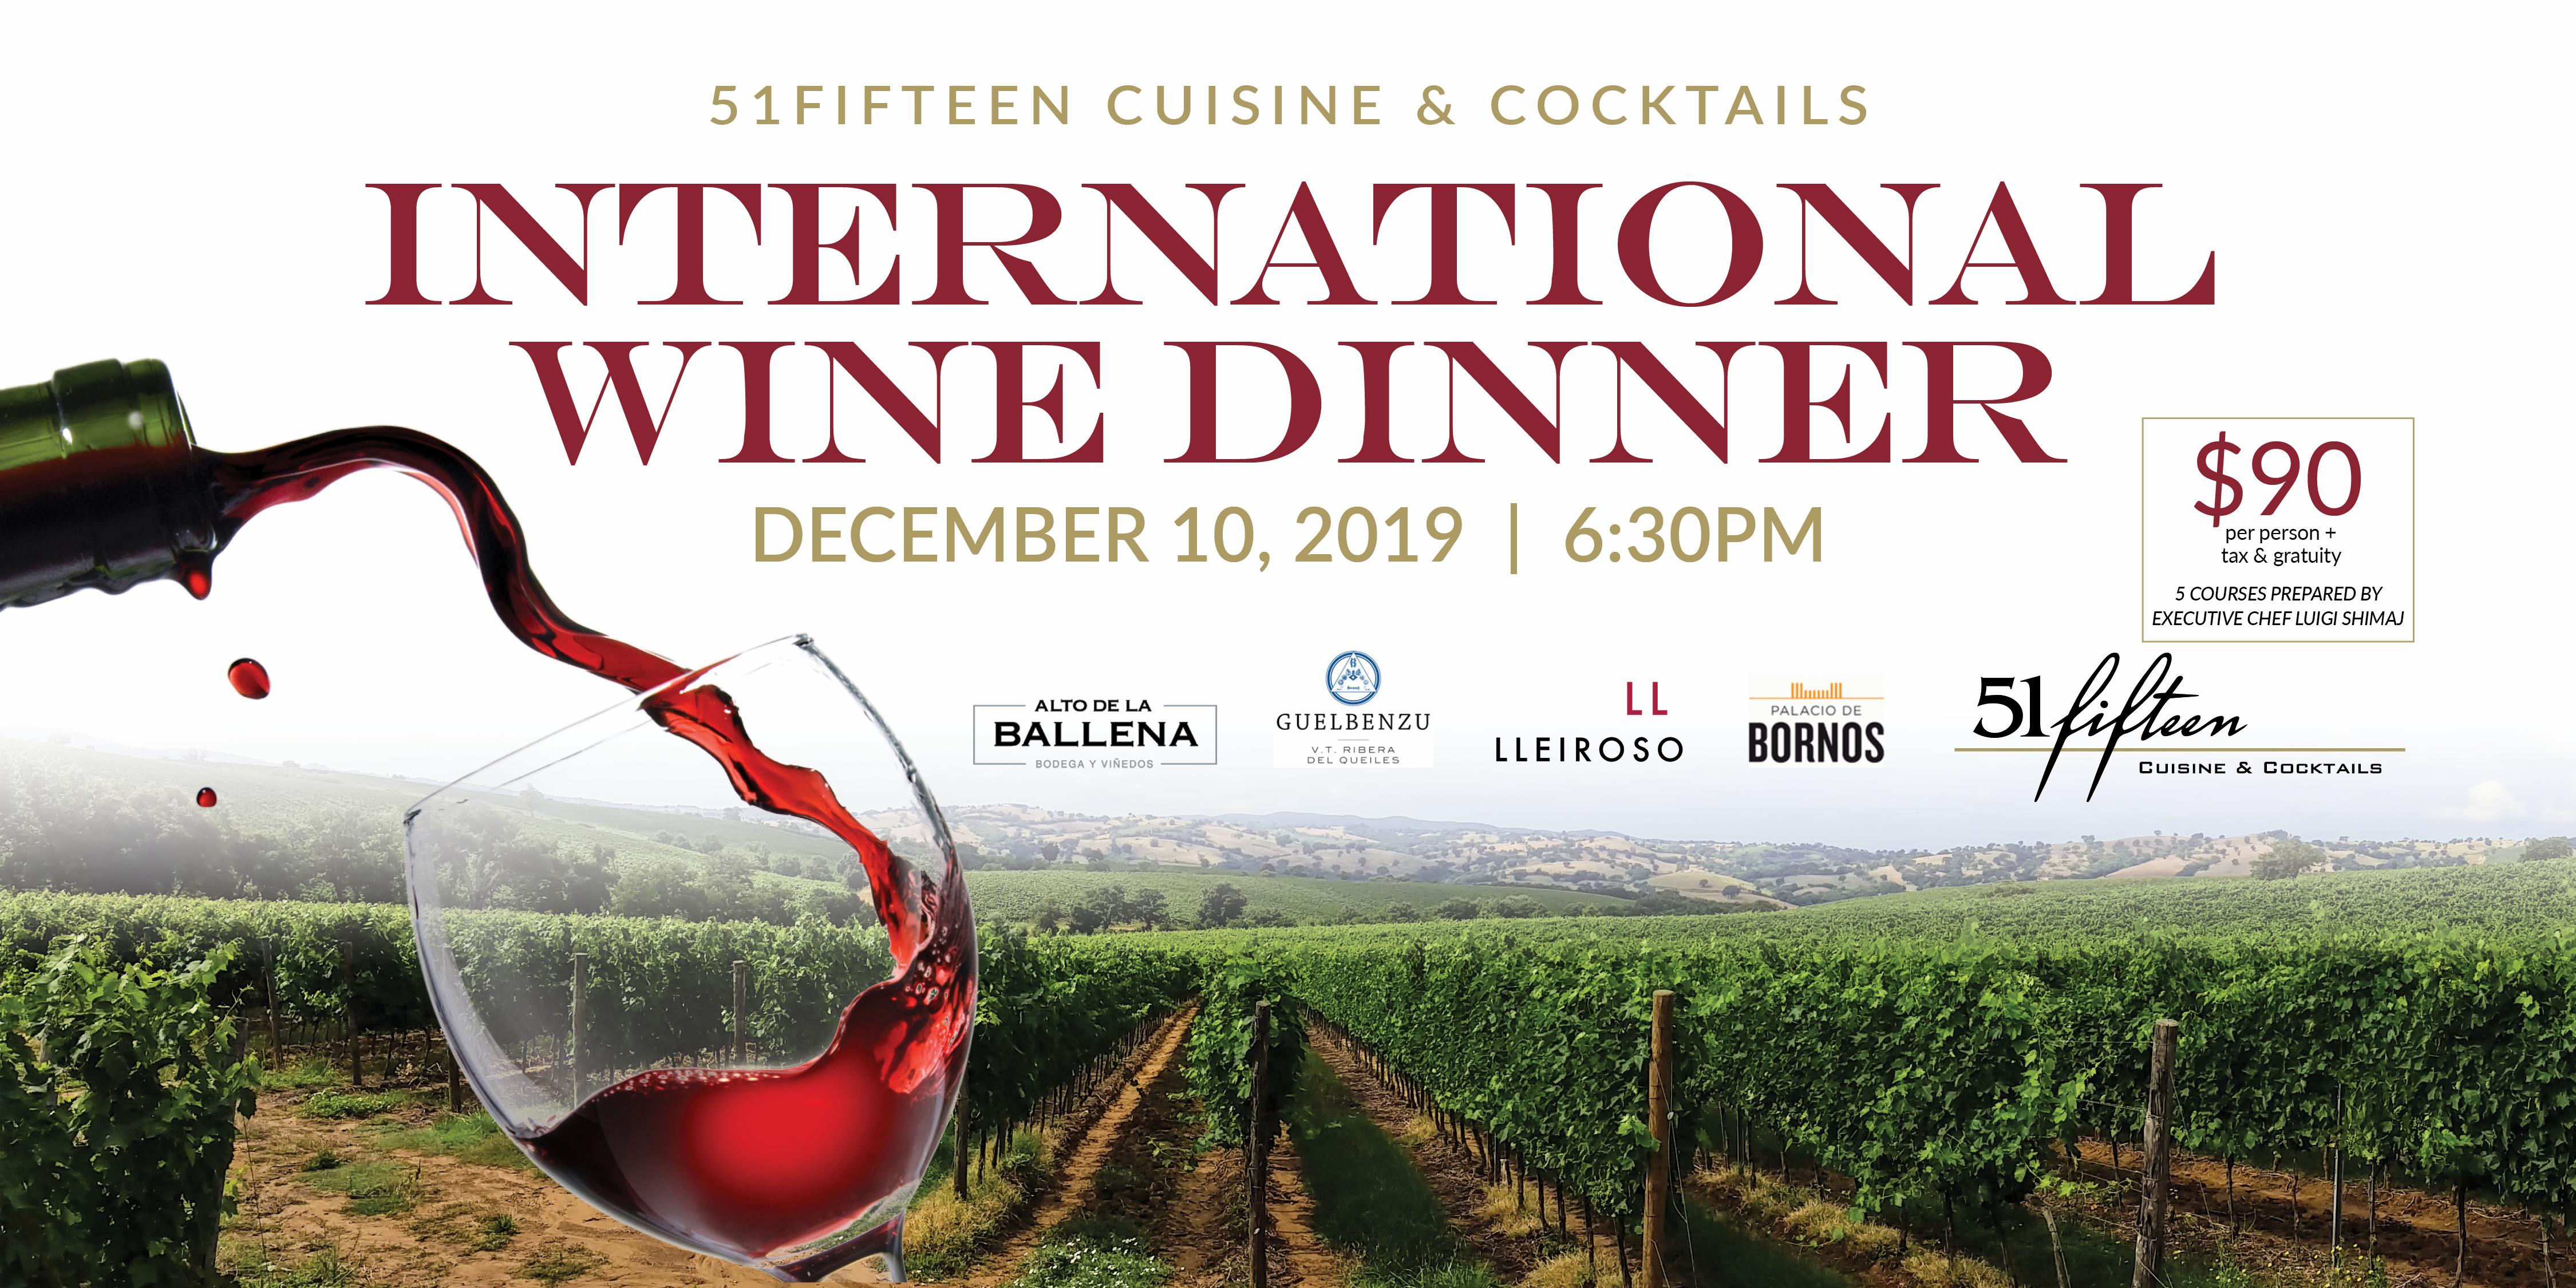 International Wine Dinner at 51fifteen Cuisine & Cocktails